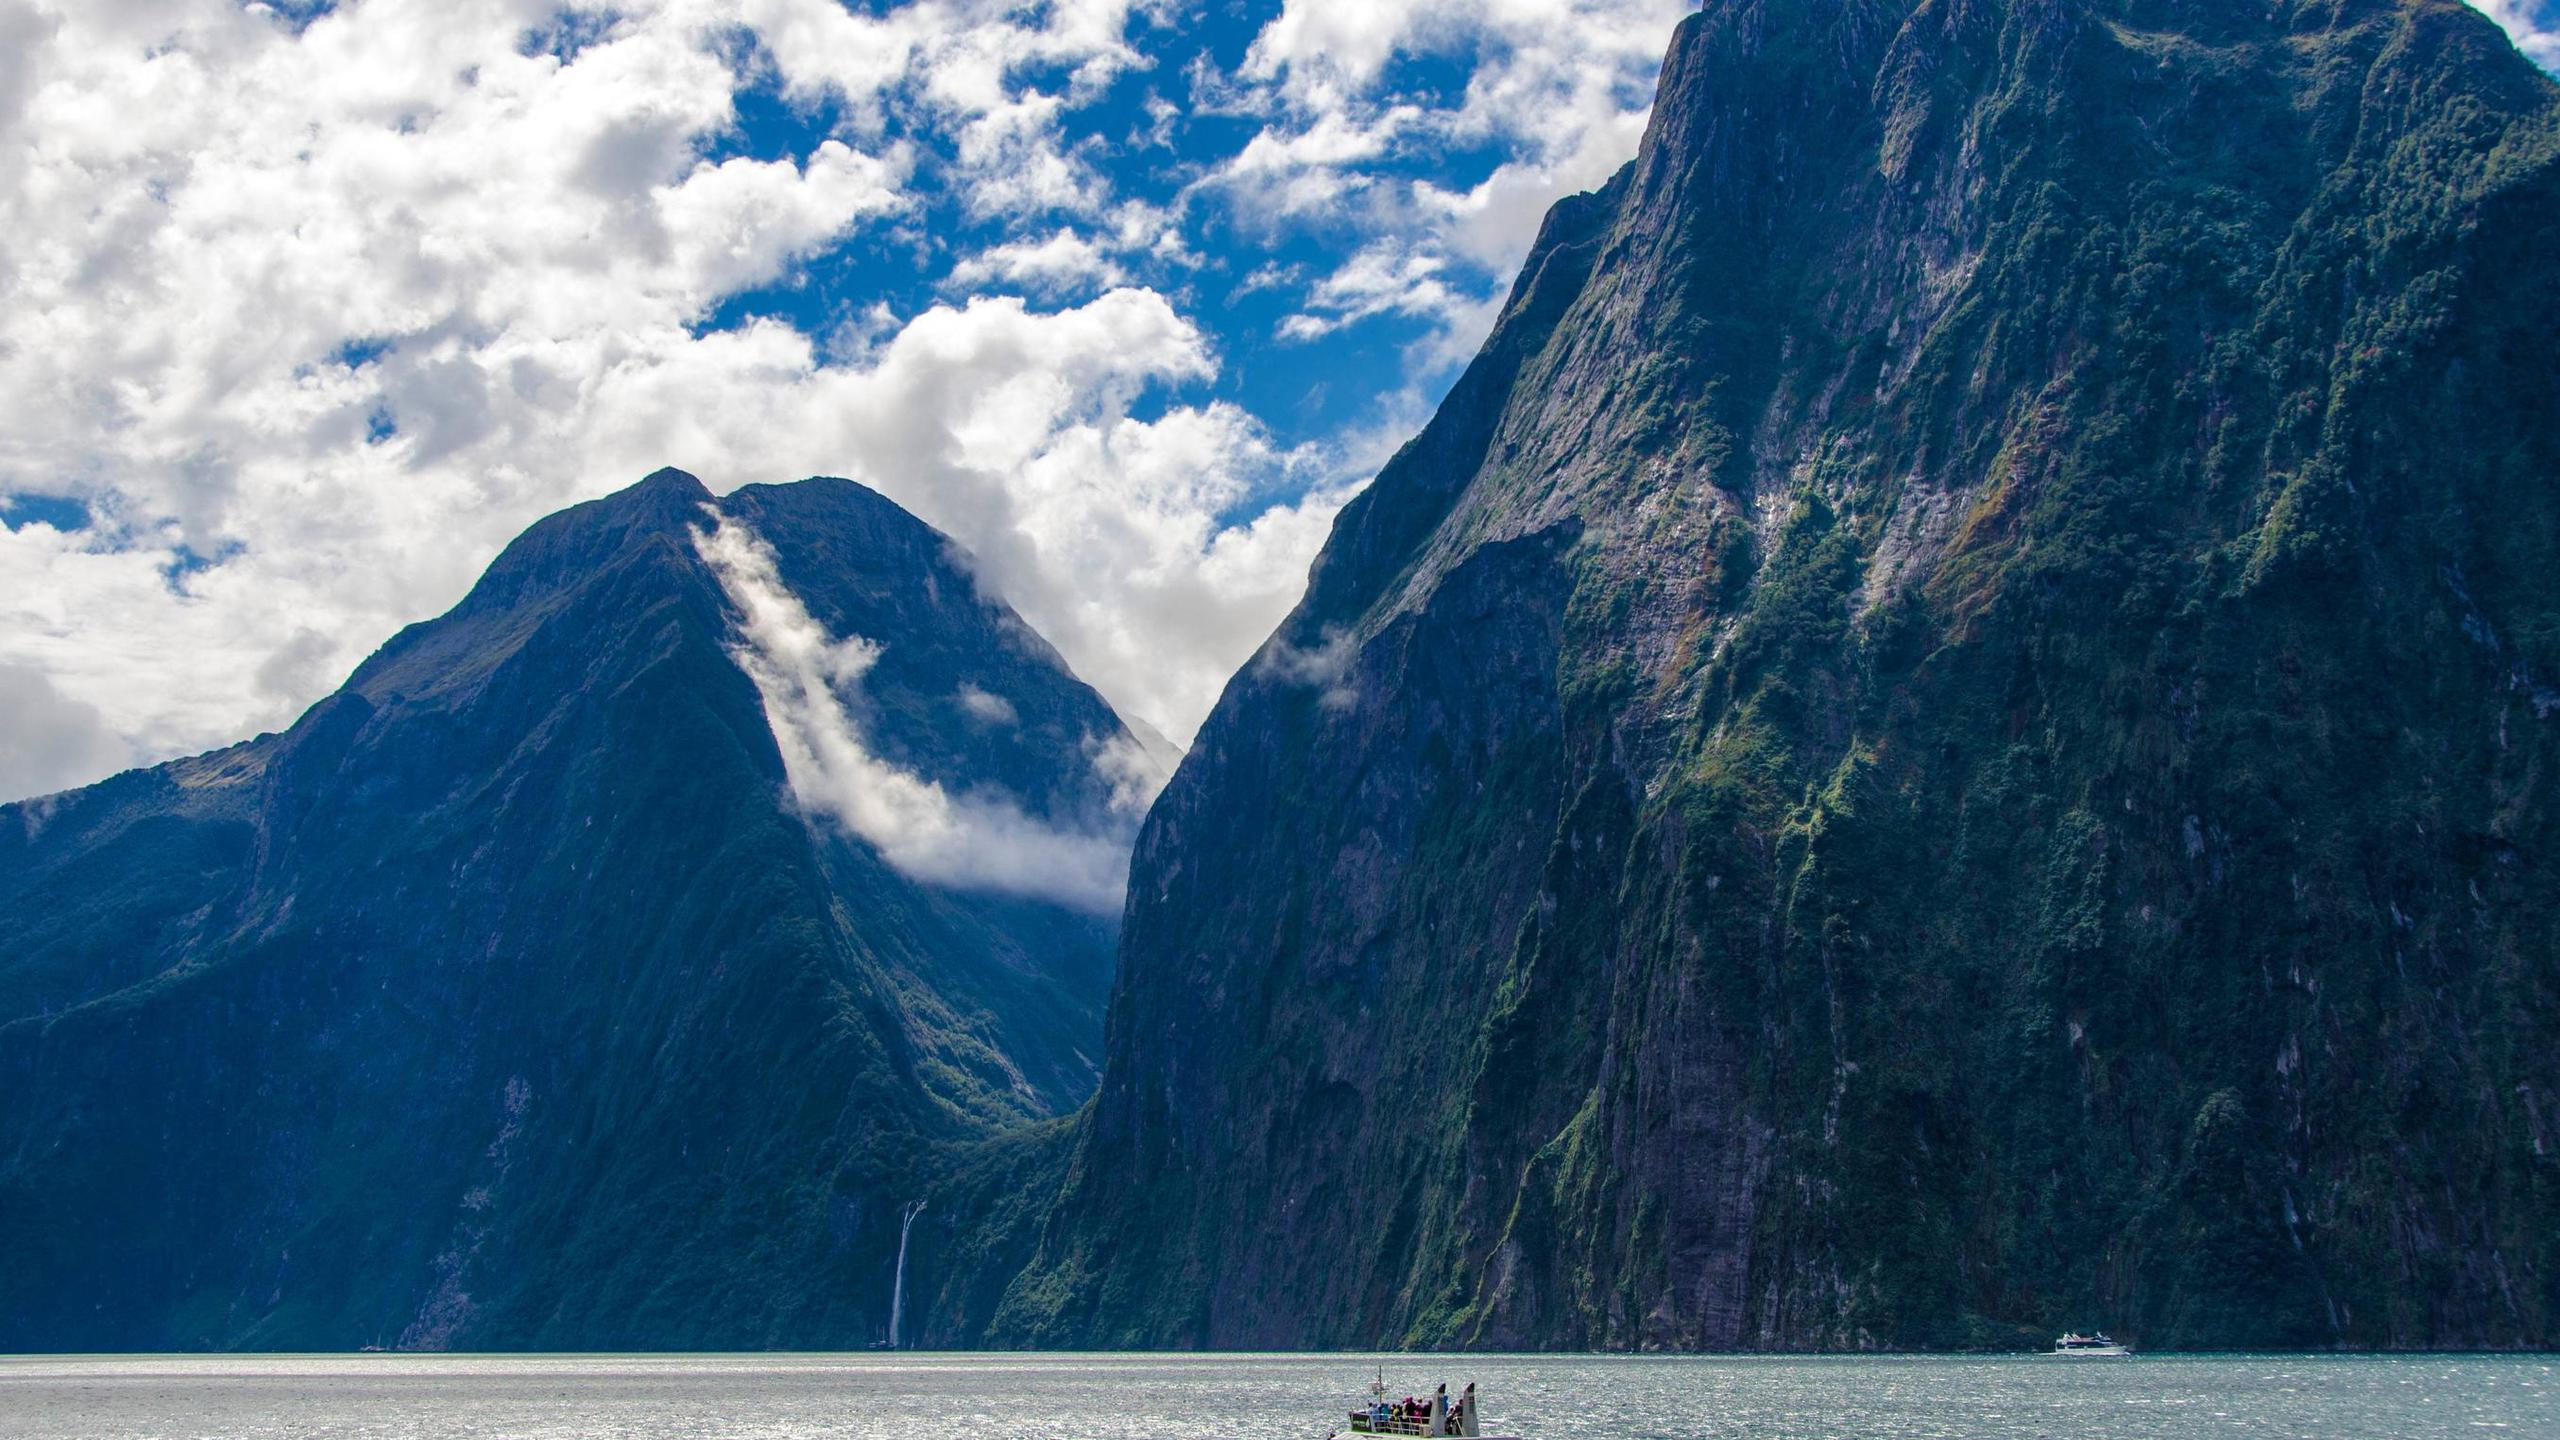 BOTPOST] Milford Sound New Zealand iimgurcom 2560x1440